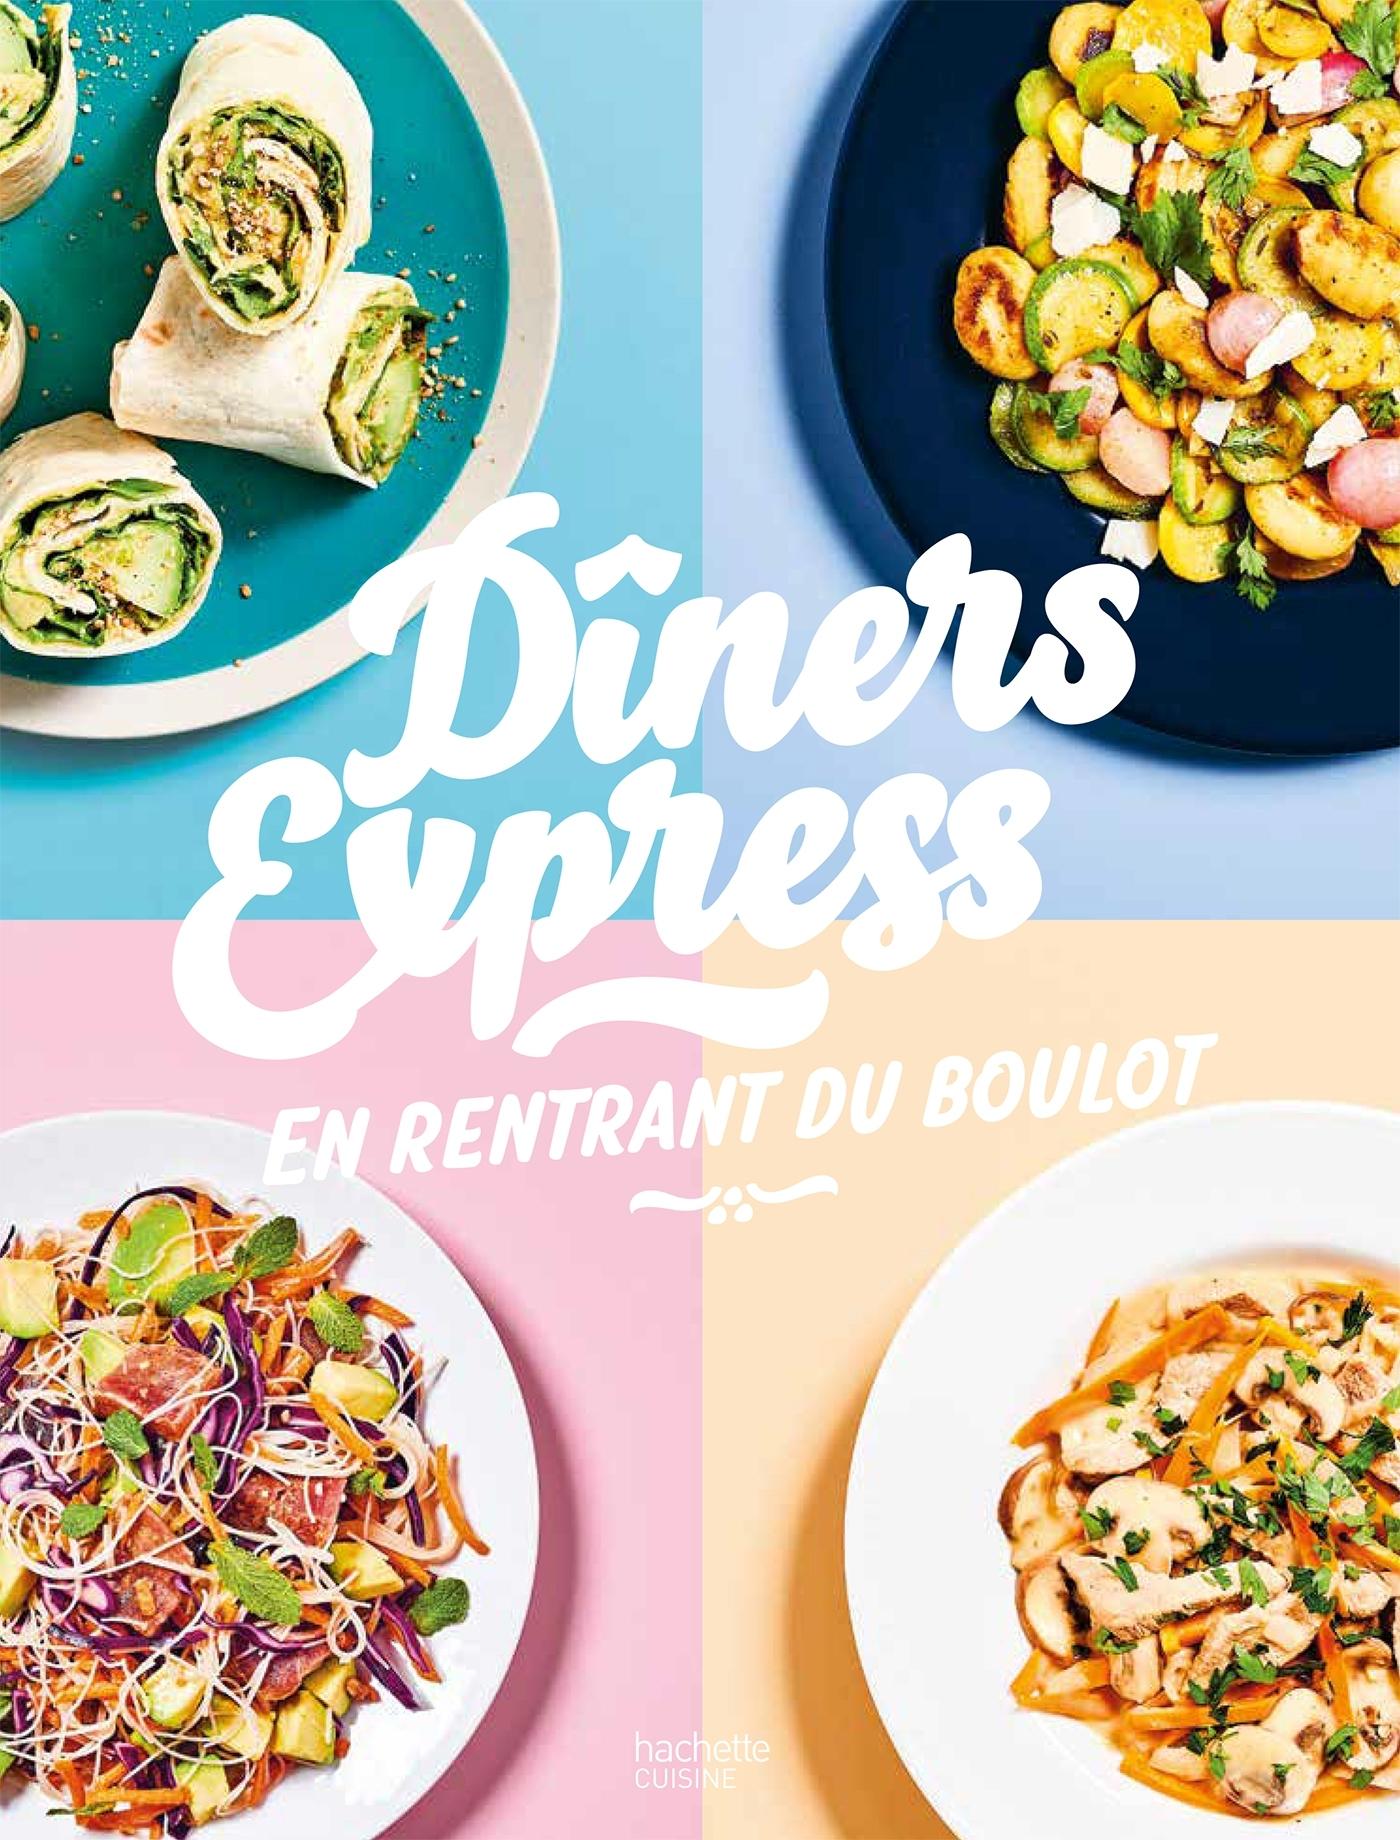 DINERS EXPRESS EN RENTRANT DU BOULOT